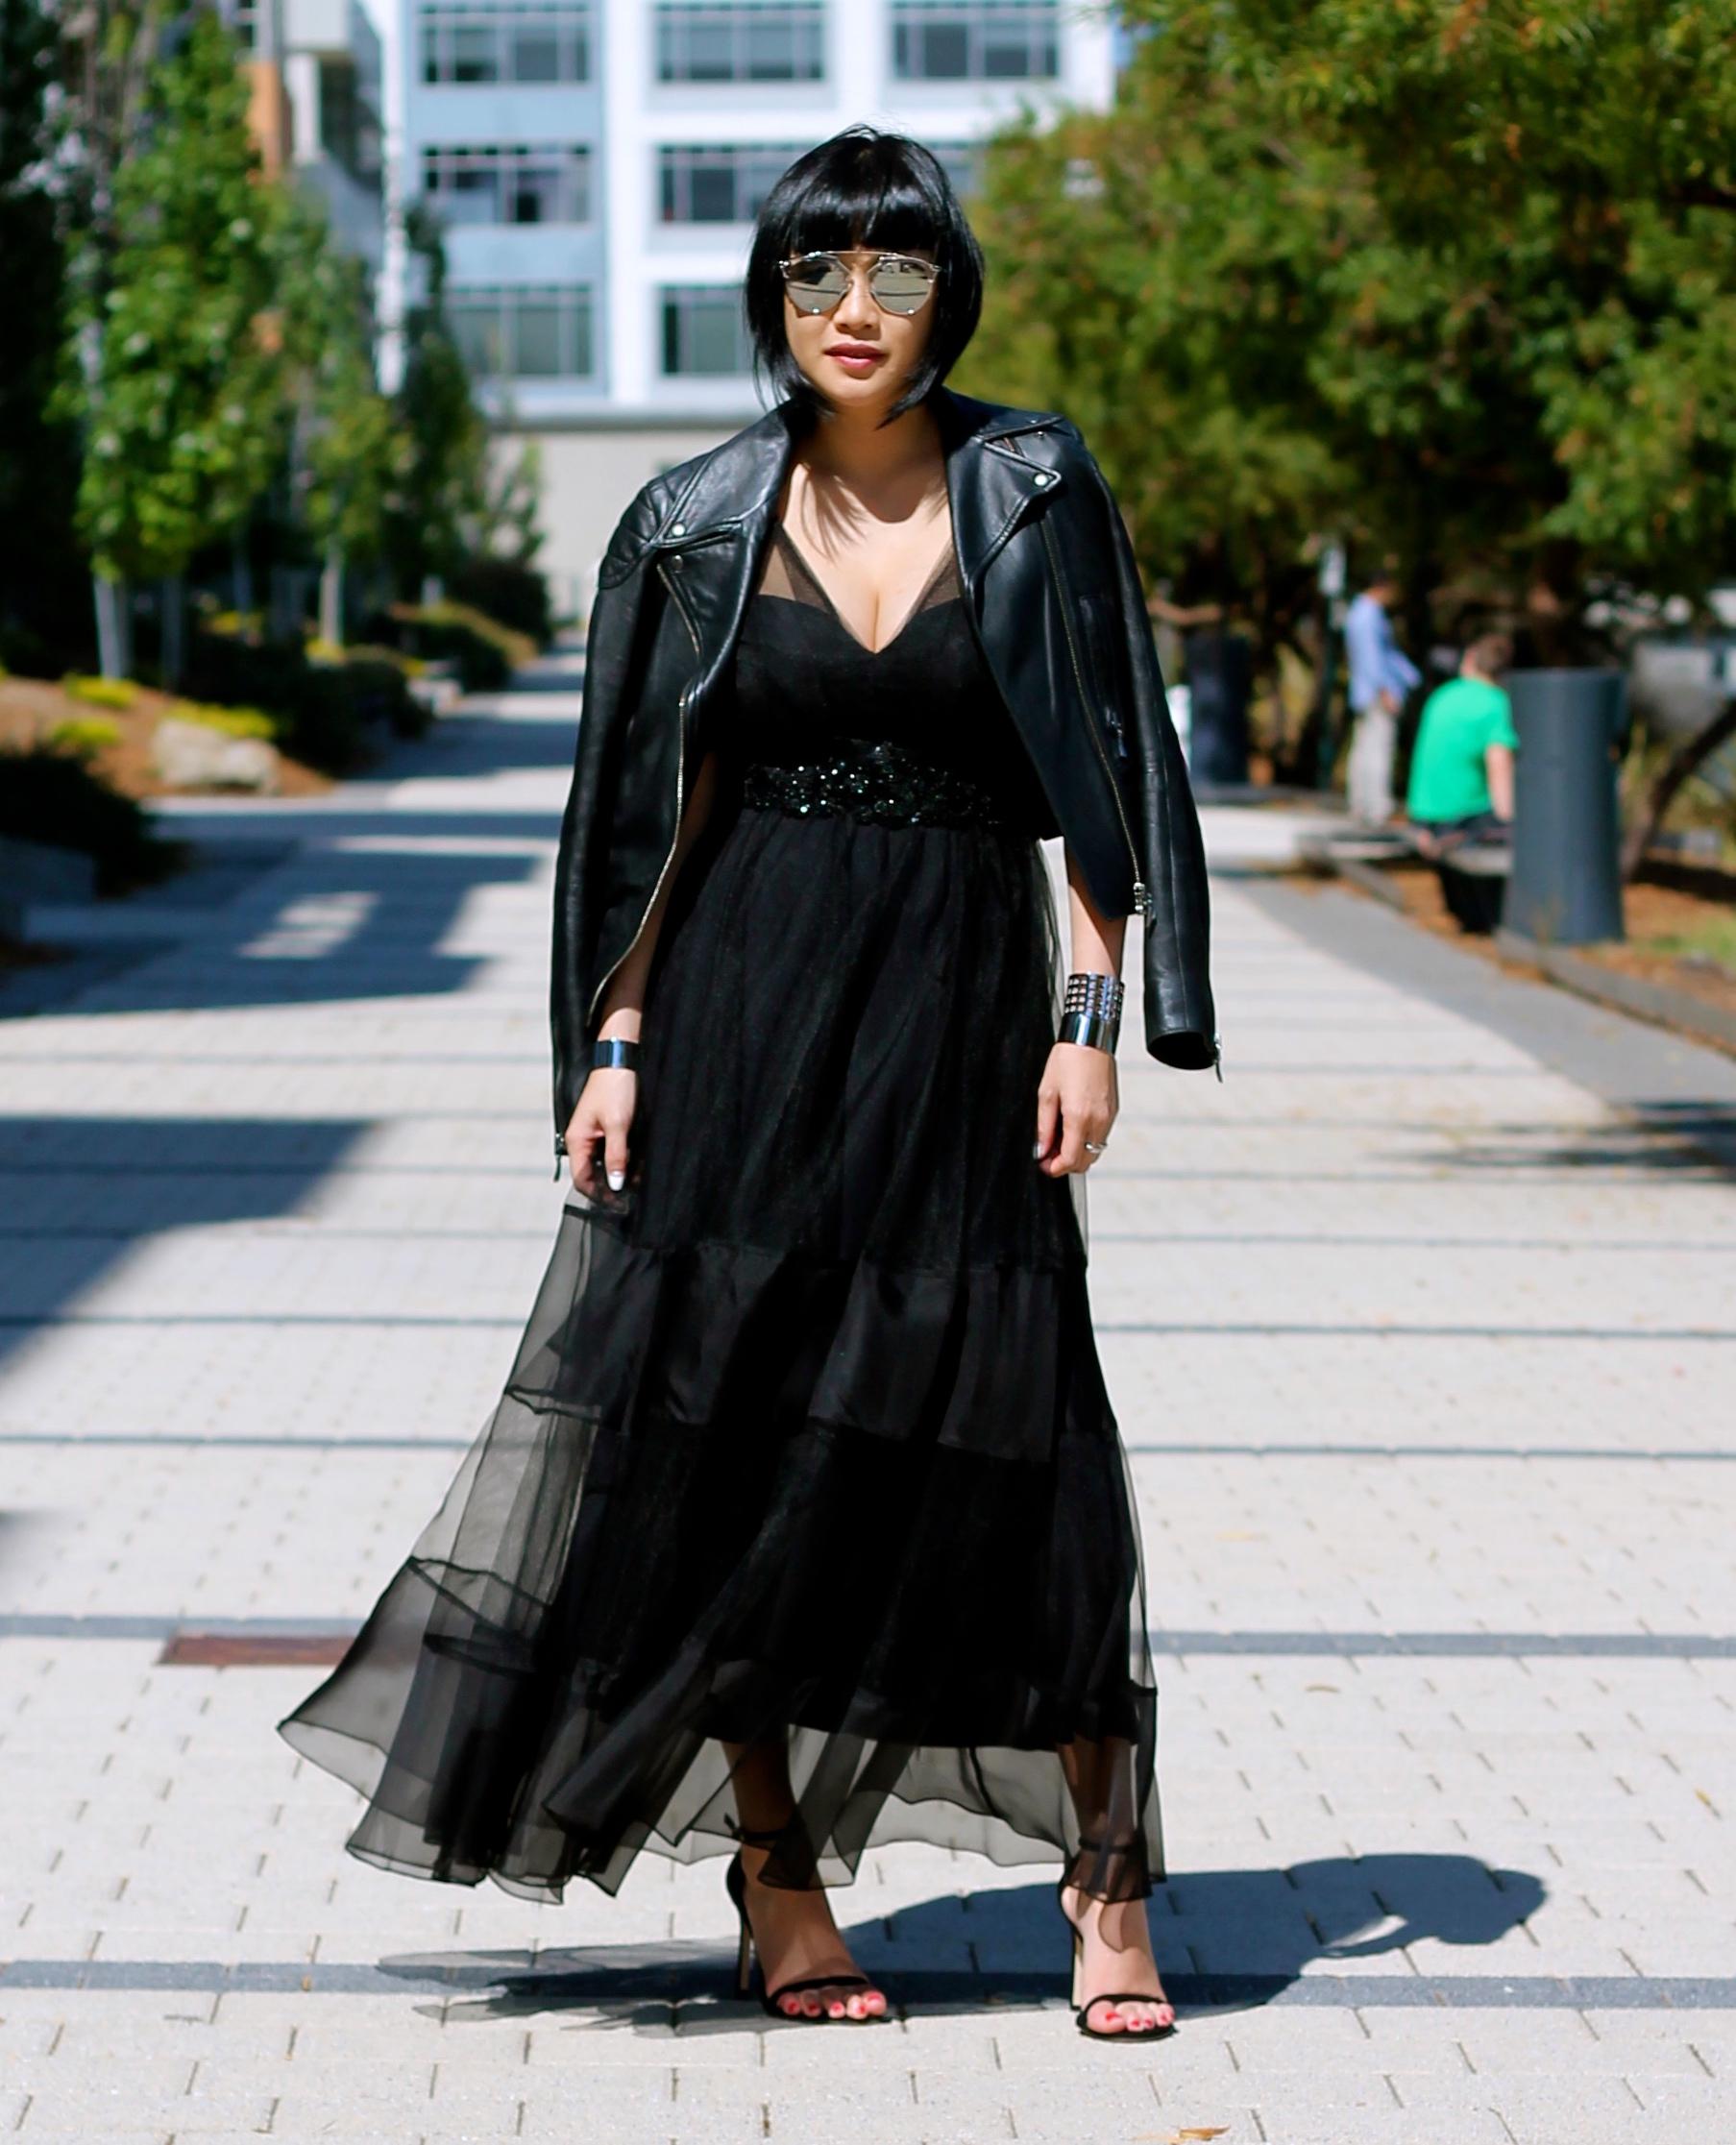 dress c/o Marchesa, Club Monaco leather jacket, Stuart Weitzman heels, Diorsunglasses, Svelte metals jewelry